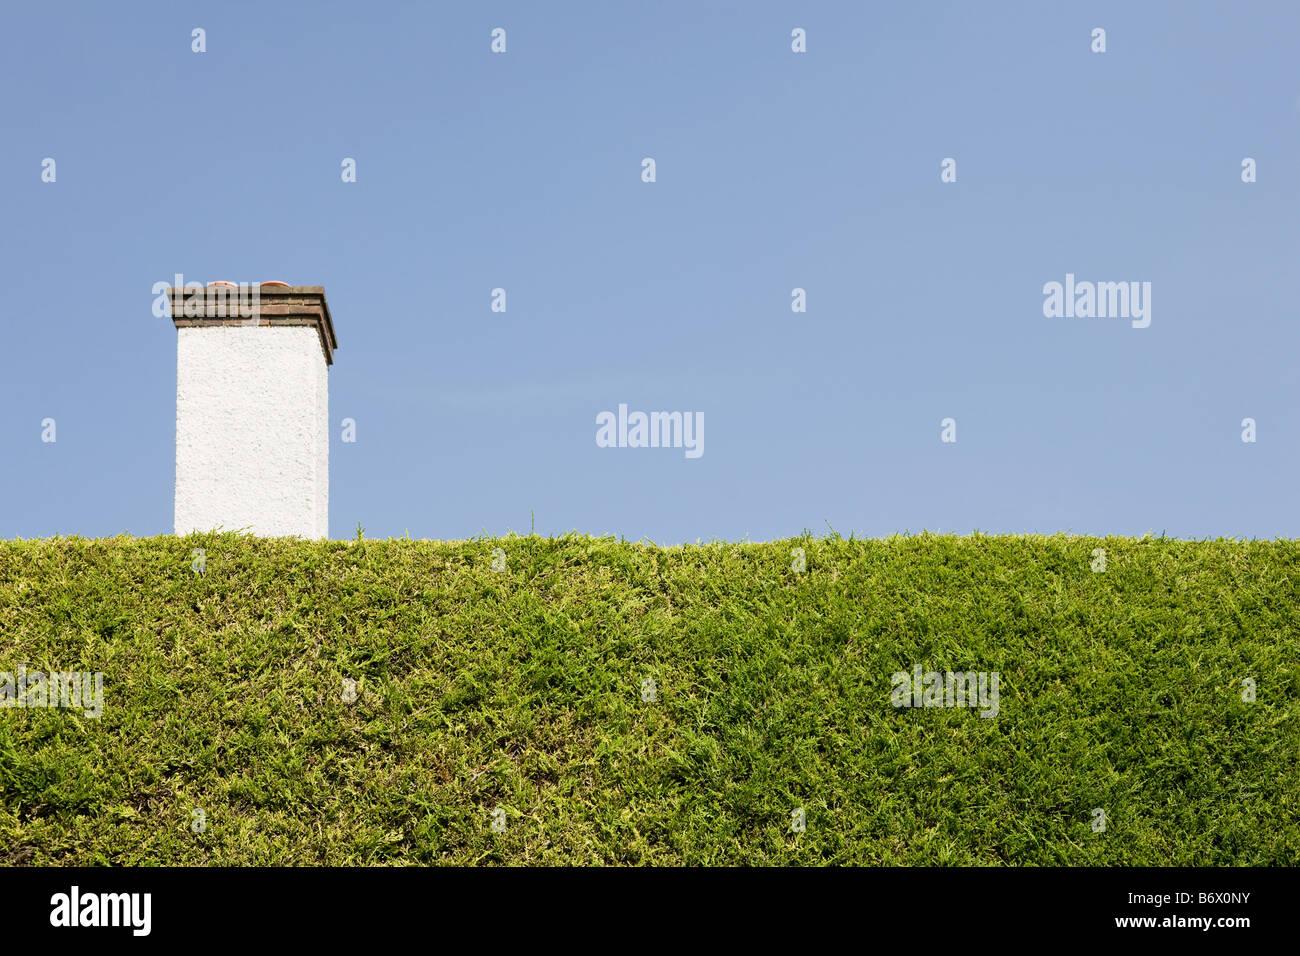 Chimney behind hedge - Stock Image